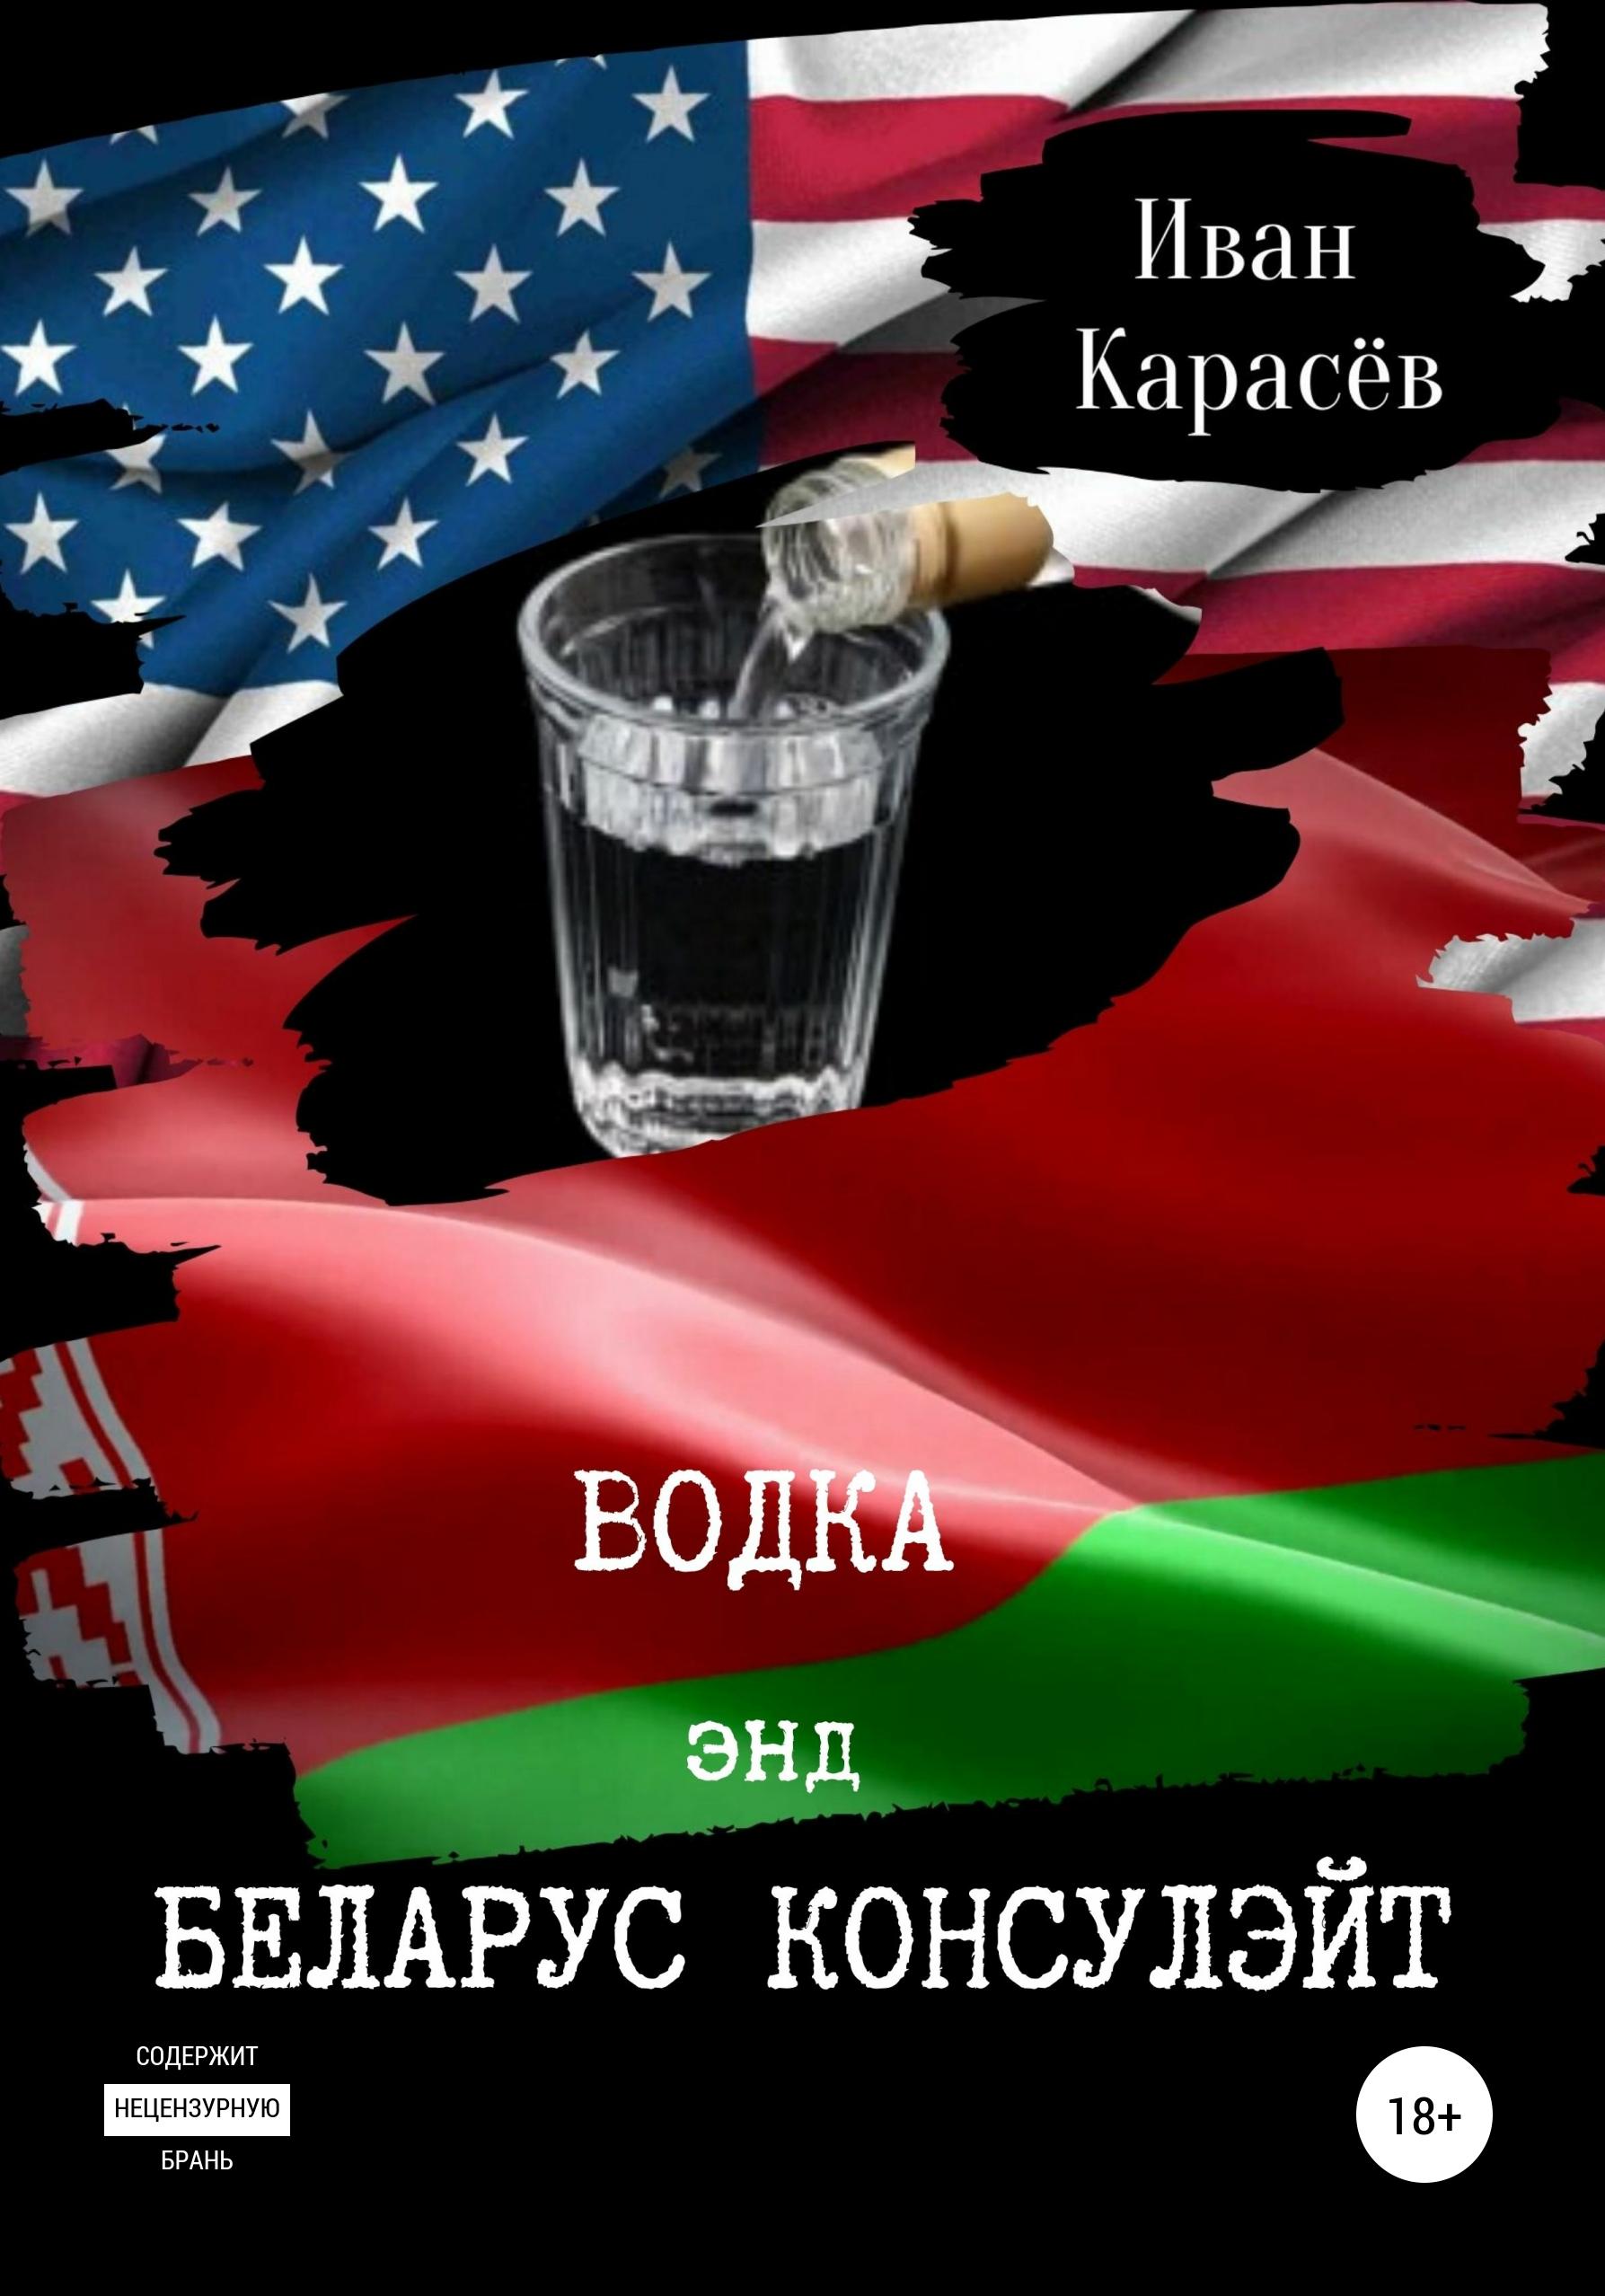 Водка энд Беларус консулэйт. Сборник рассказов